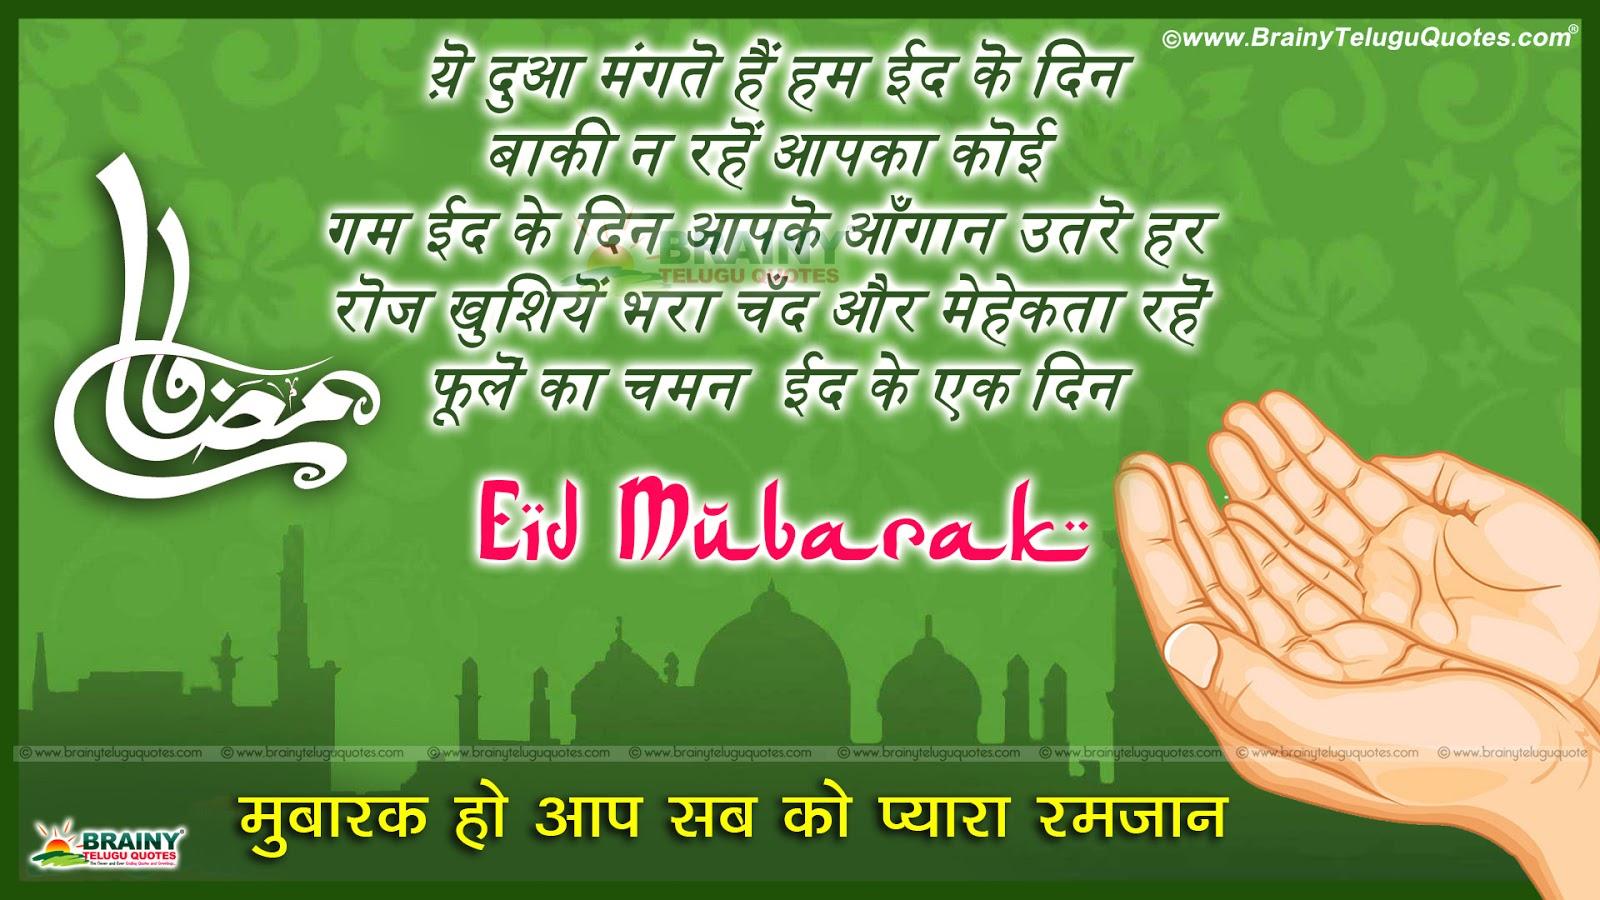 Hindi eid mubarak quotes and greetings new brainyteluguquotes free eid mubarak quotes for friends happy ramadan 2016 quotes online happy ramadan greetings m4hsunfo